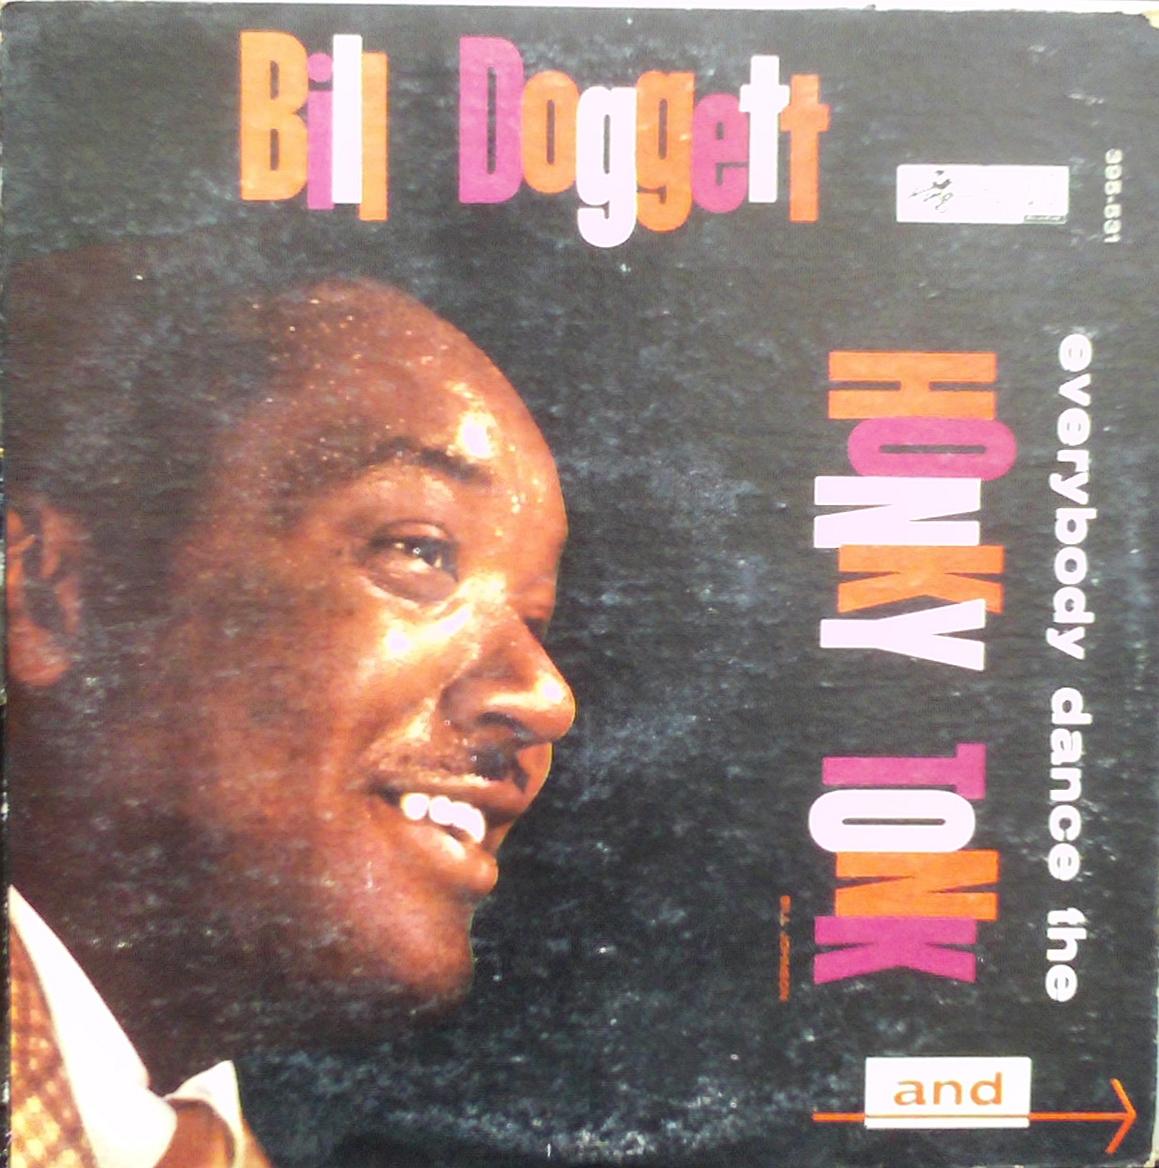 Bill Doggett - Everybody Dance The Honky Tonk